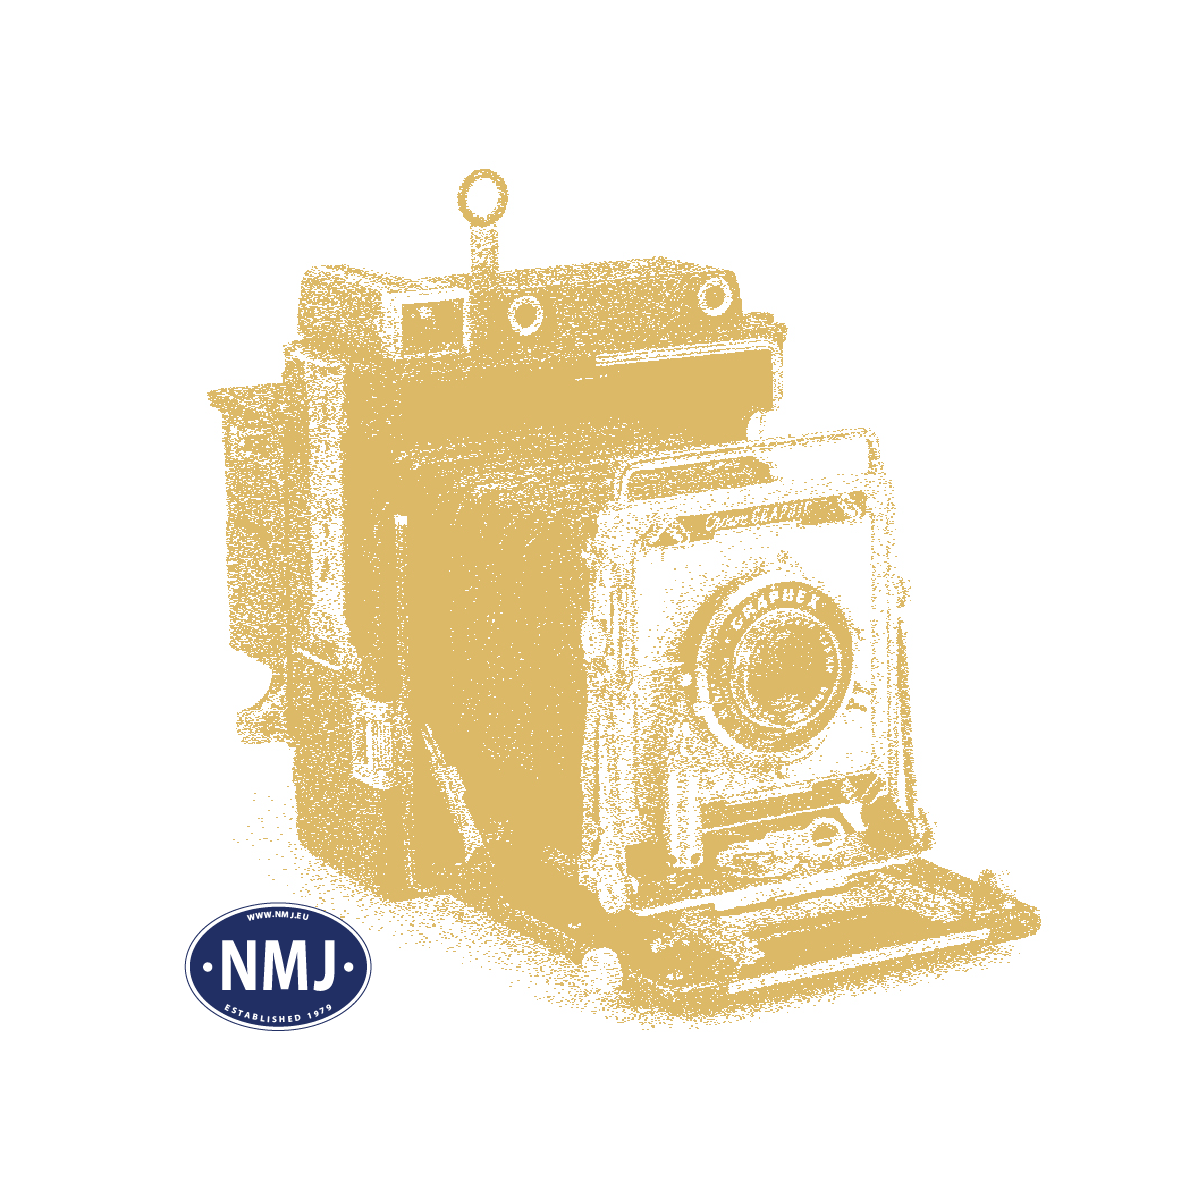 NMJT90207 - NMJ Topline MAV M61.005, DCC m/ Sound